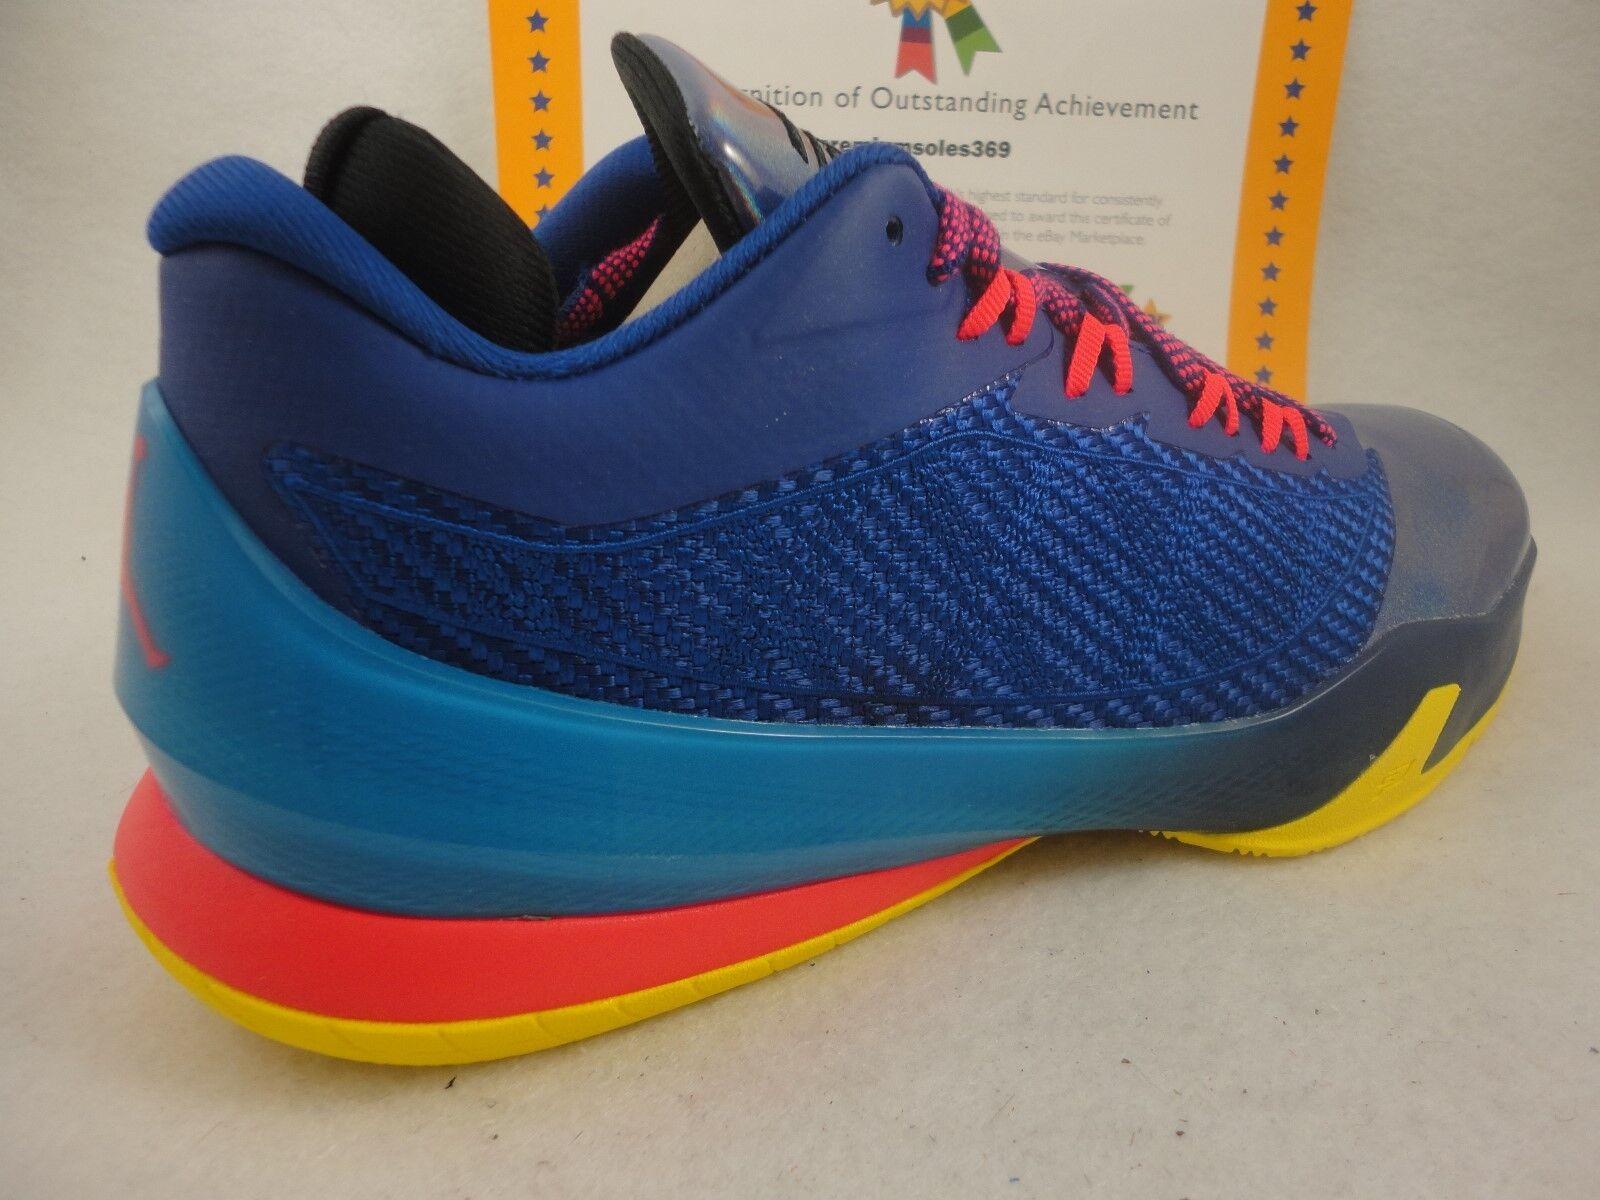 c3e1dd043d Nike Jordan CP3 VIII, Deep Royal / Infrared 23 / Tour Yellow, 684855 420